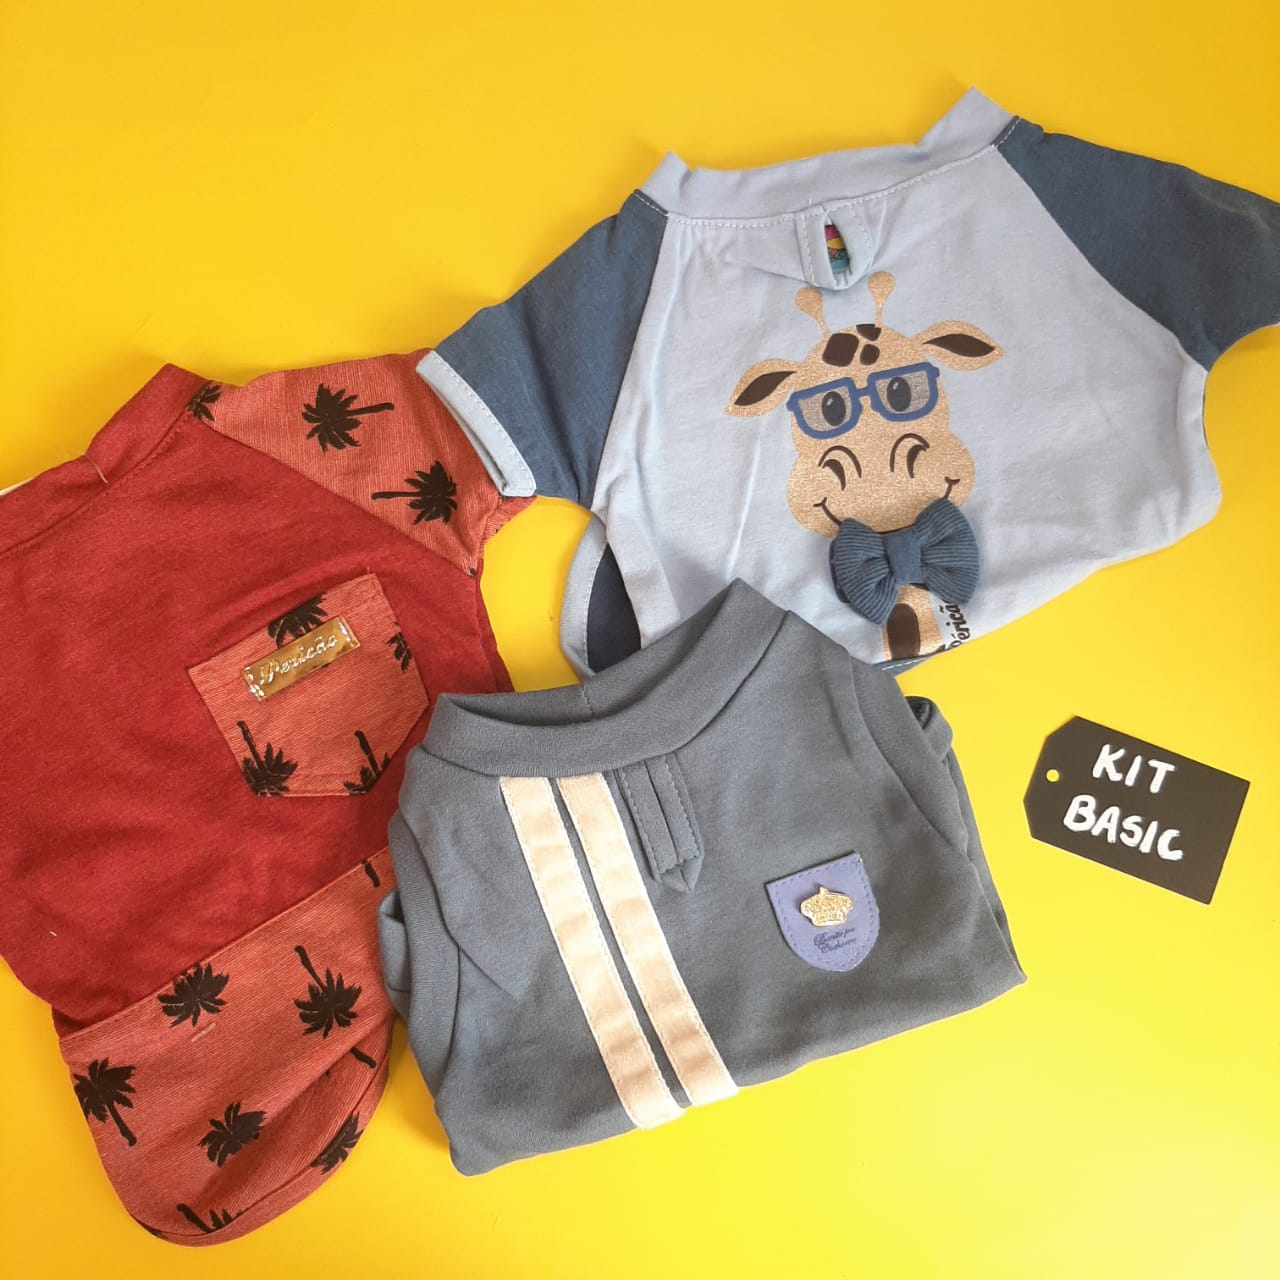 Kit Basic   Macho - Camiseta Rafic + Camisa Tropical + Regata Matte